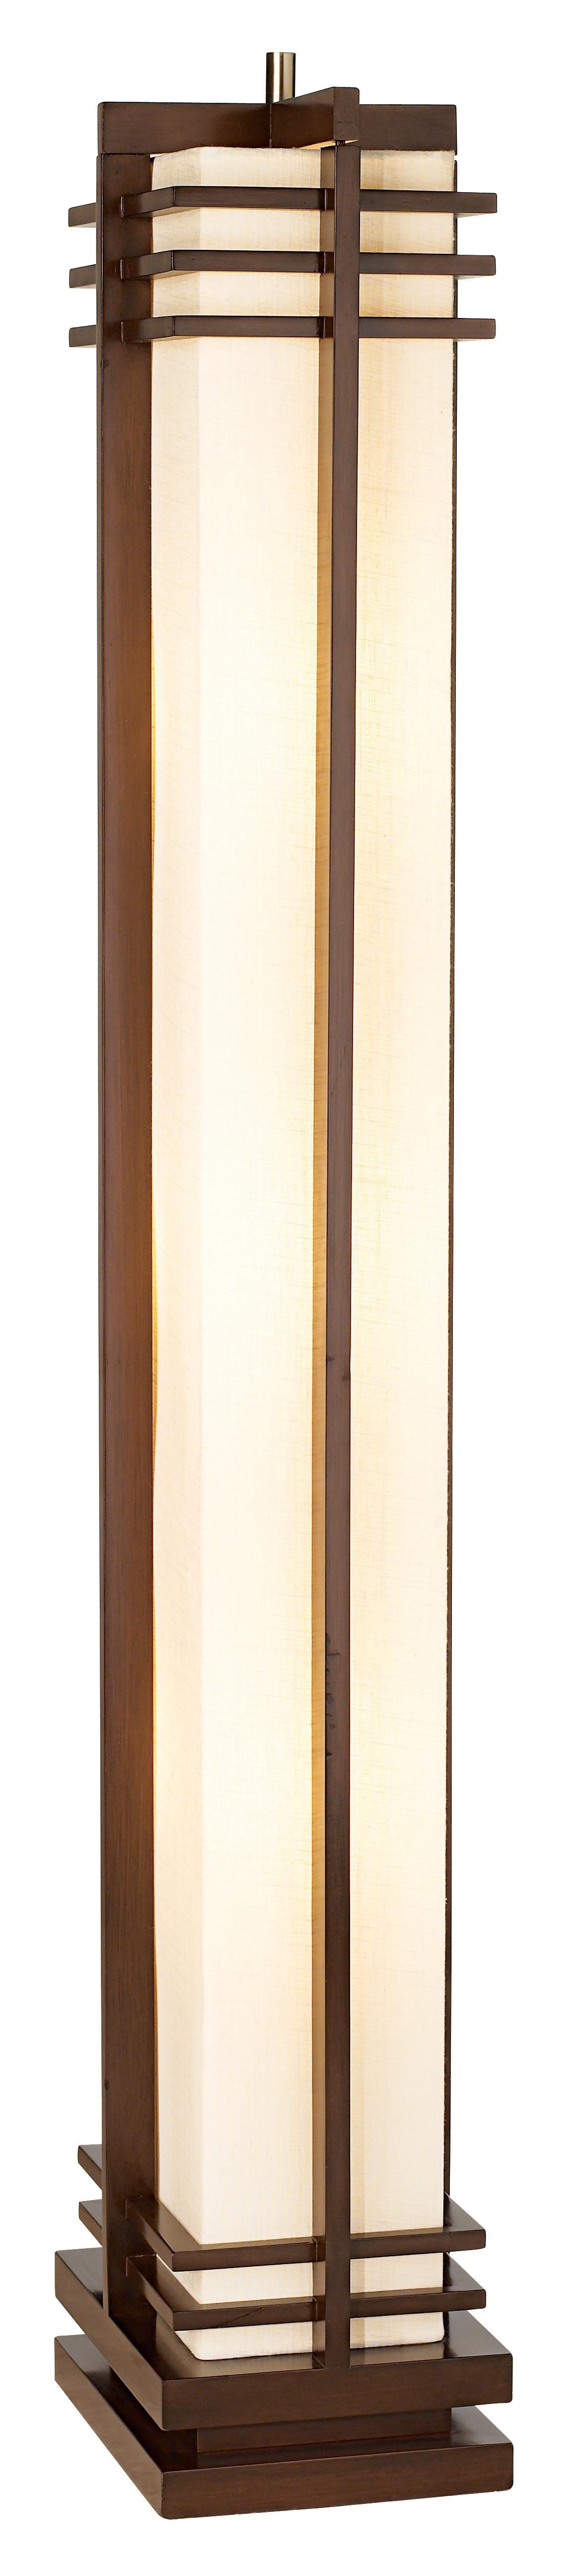 Possini Euro Design Deco Style Column Floor Lamp Chinese Lamp